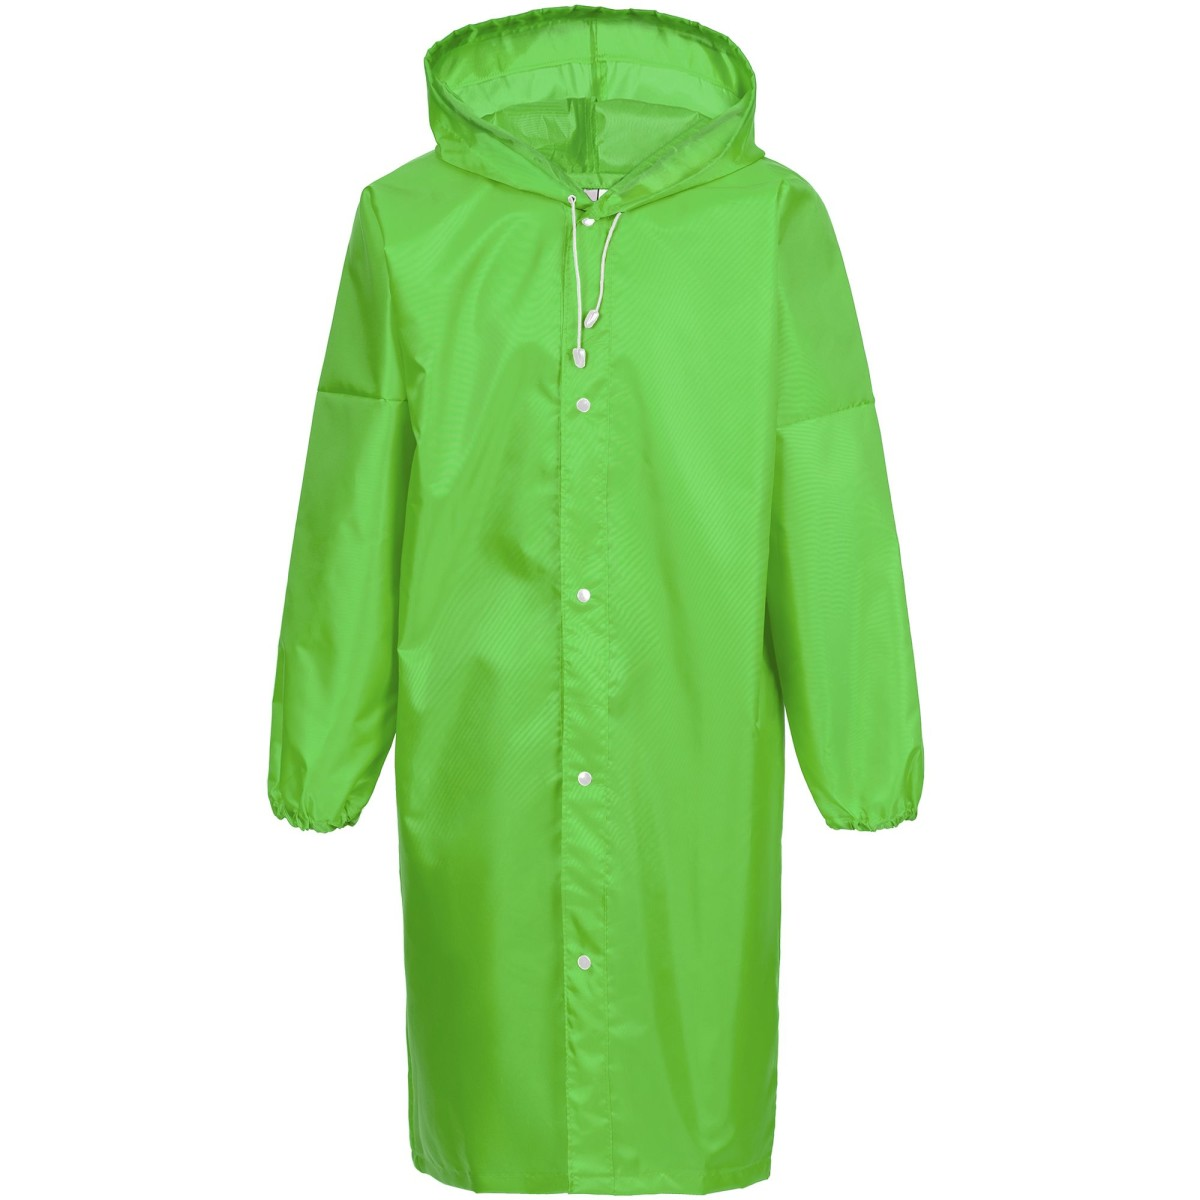 Дождевик Rainman Strong зеленый M